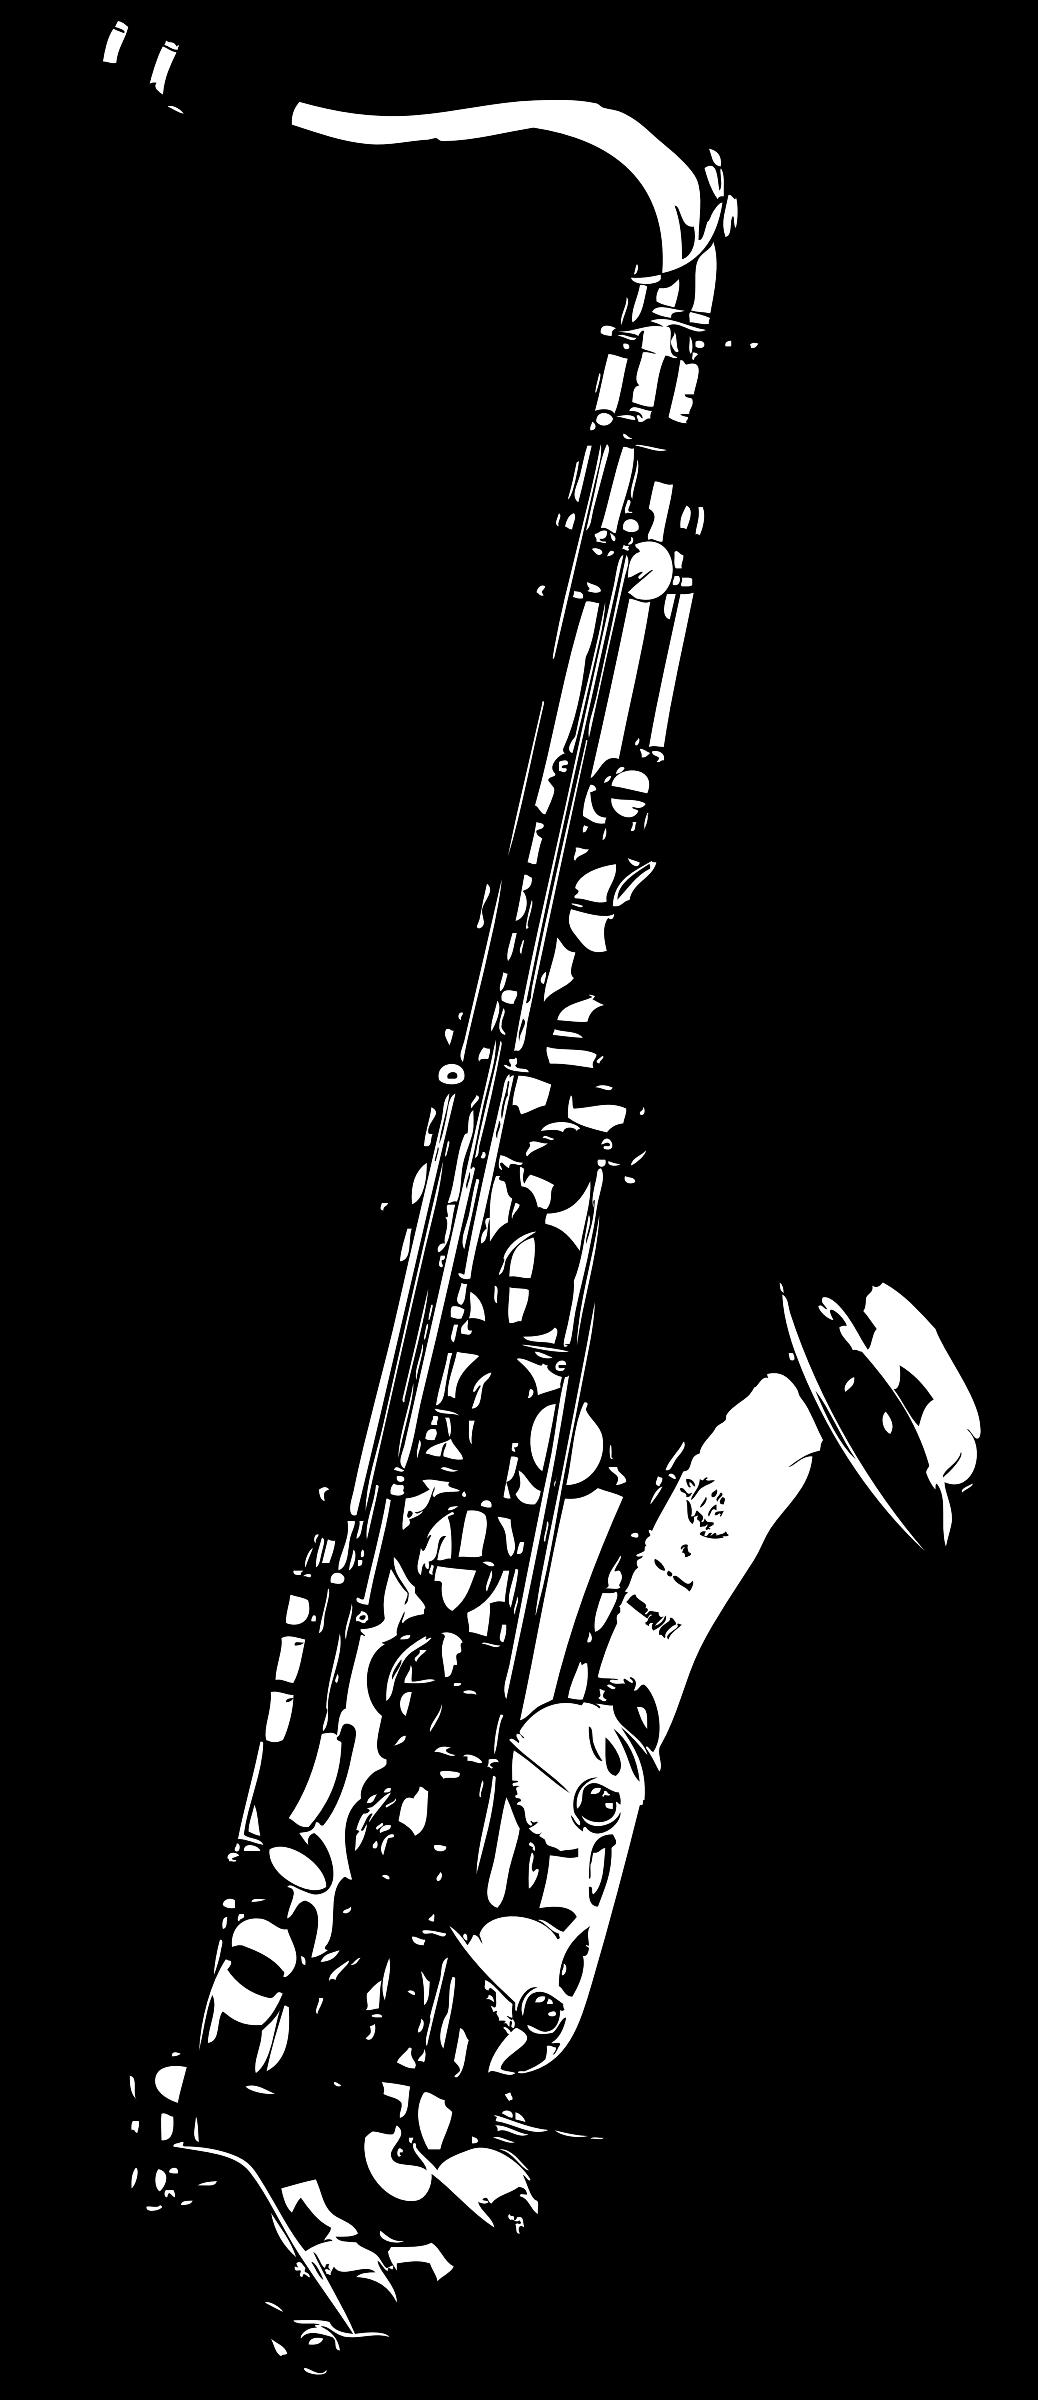 Tenor saxophone big image. Clarinet clipart bass